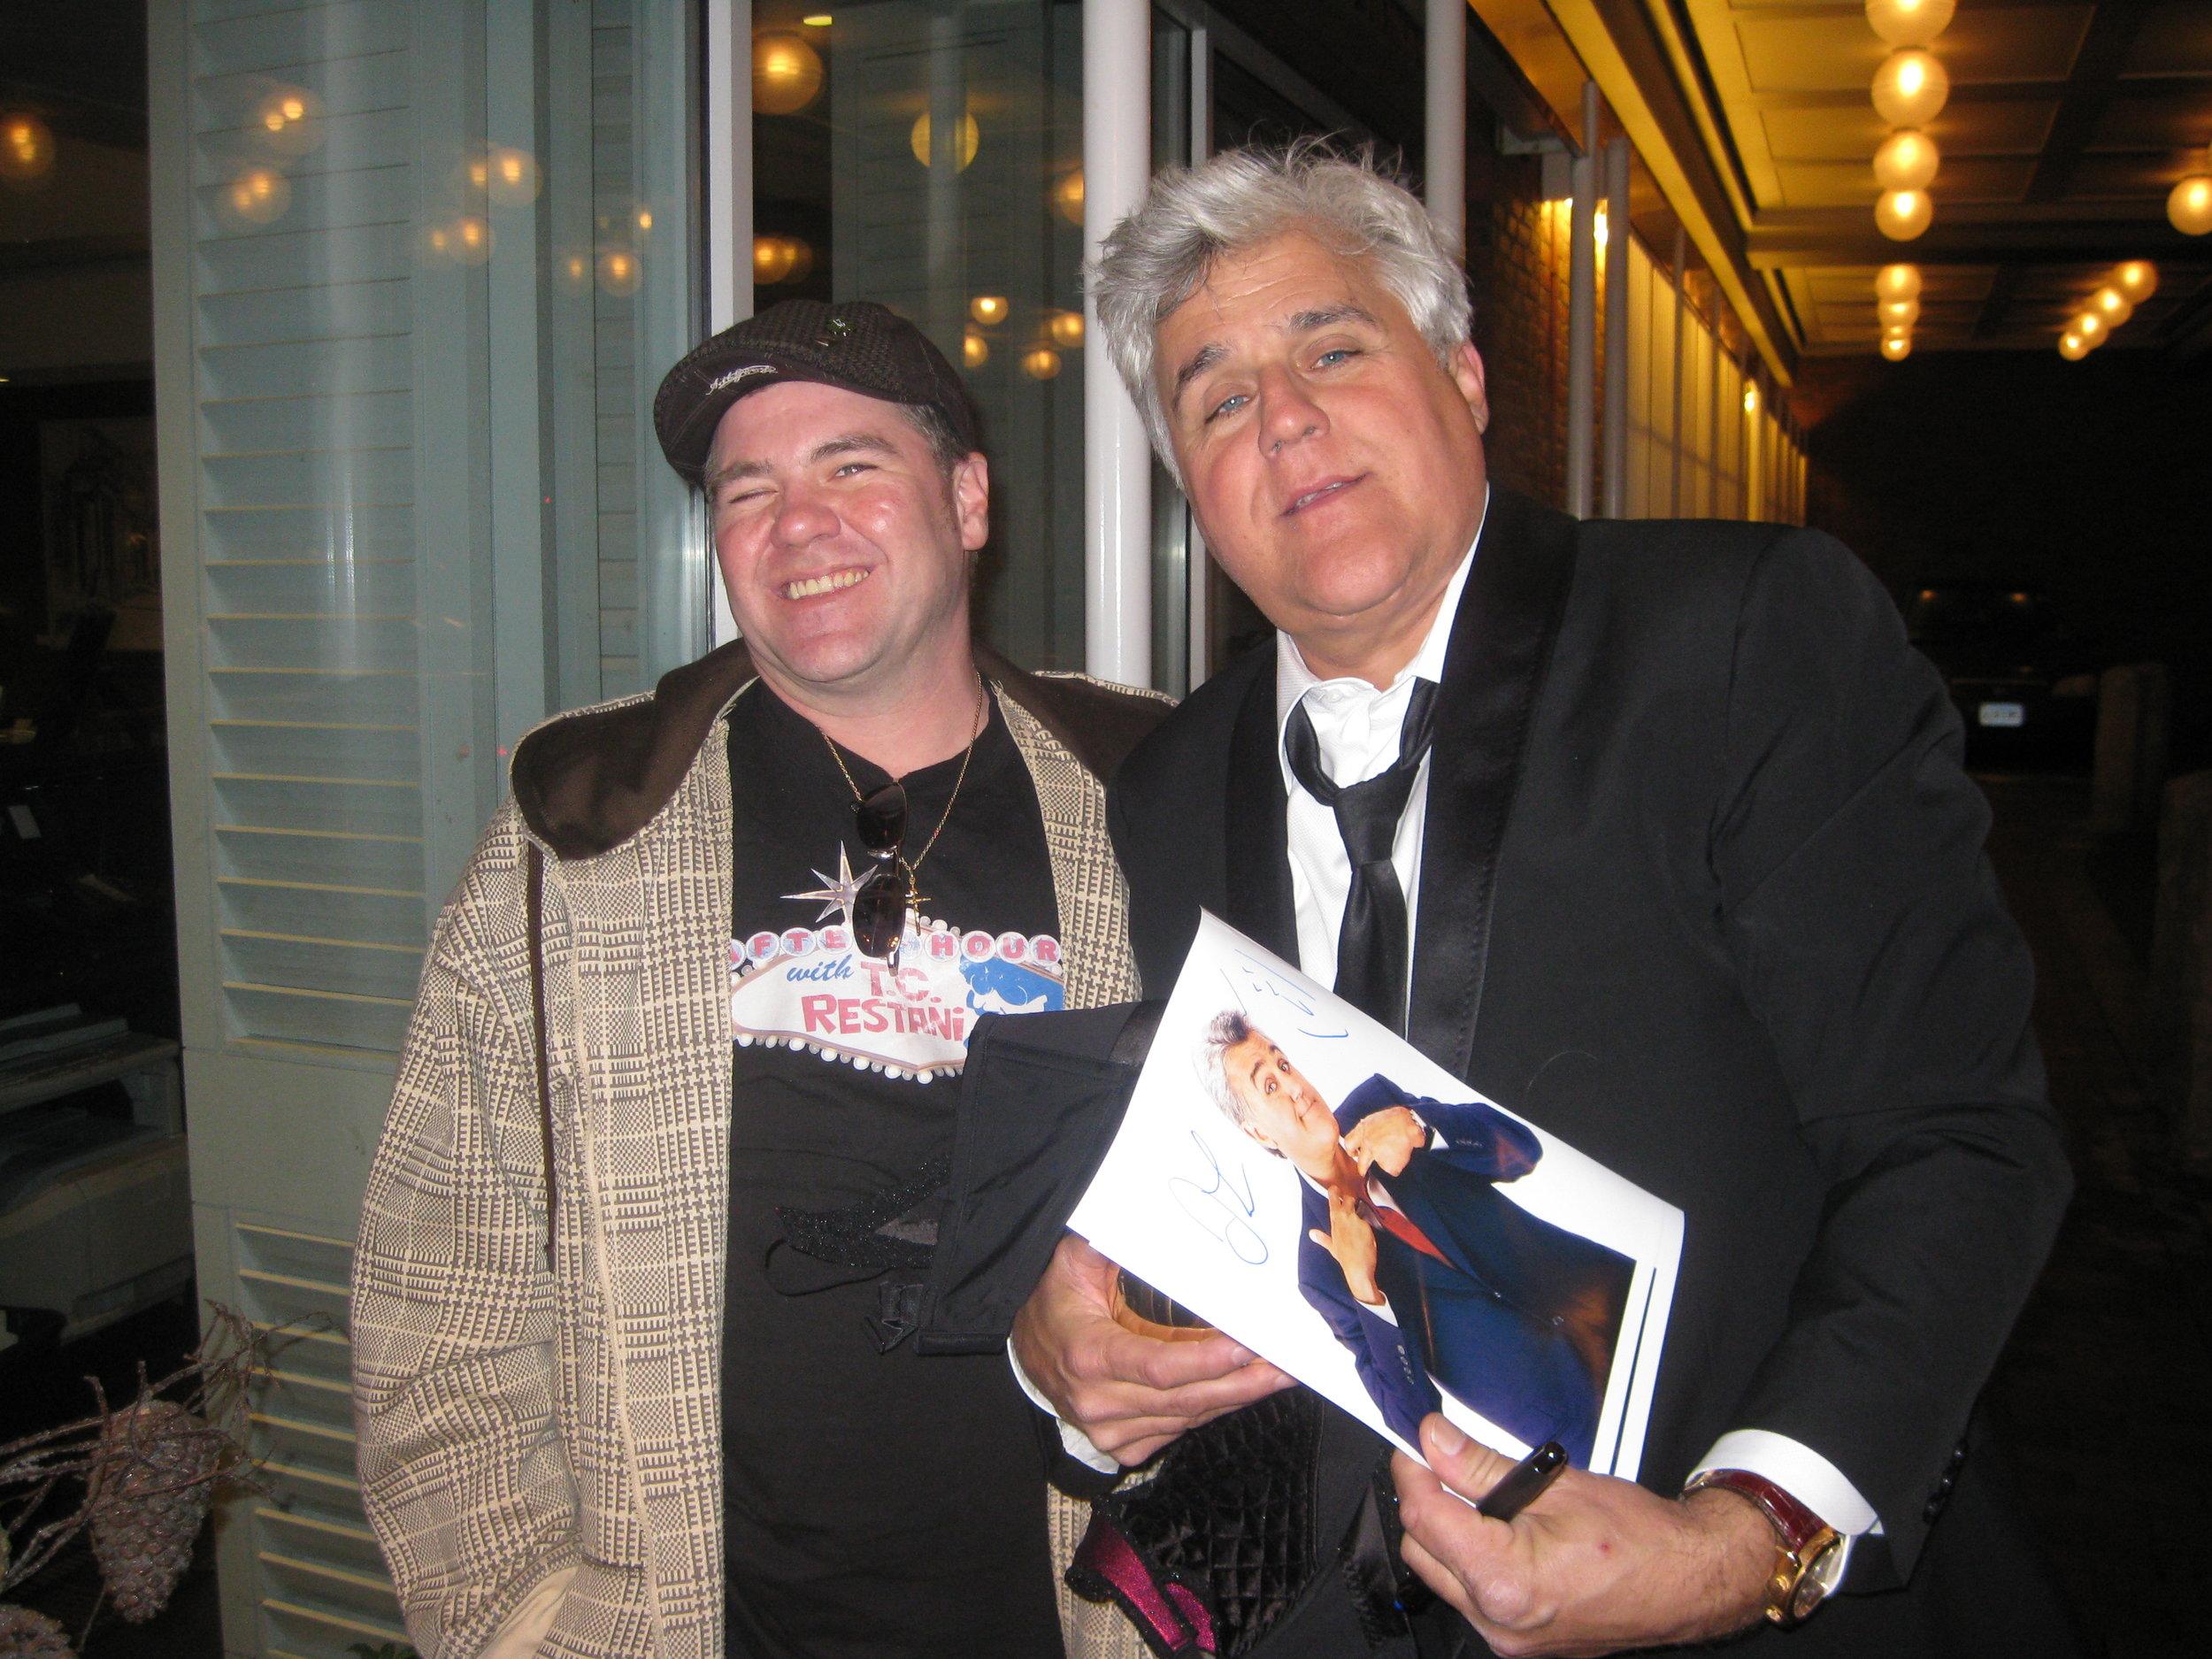 South Boston Jeff with Jay Leno